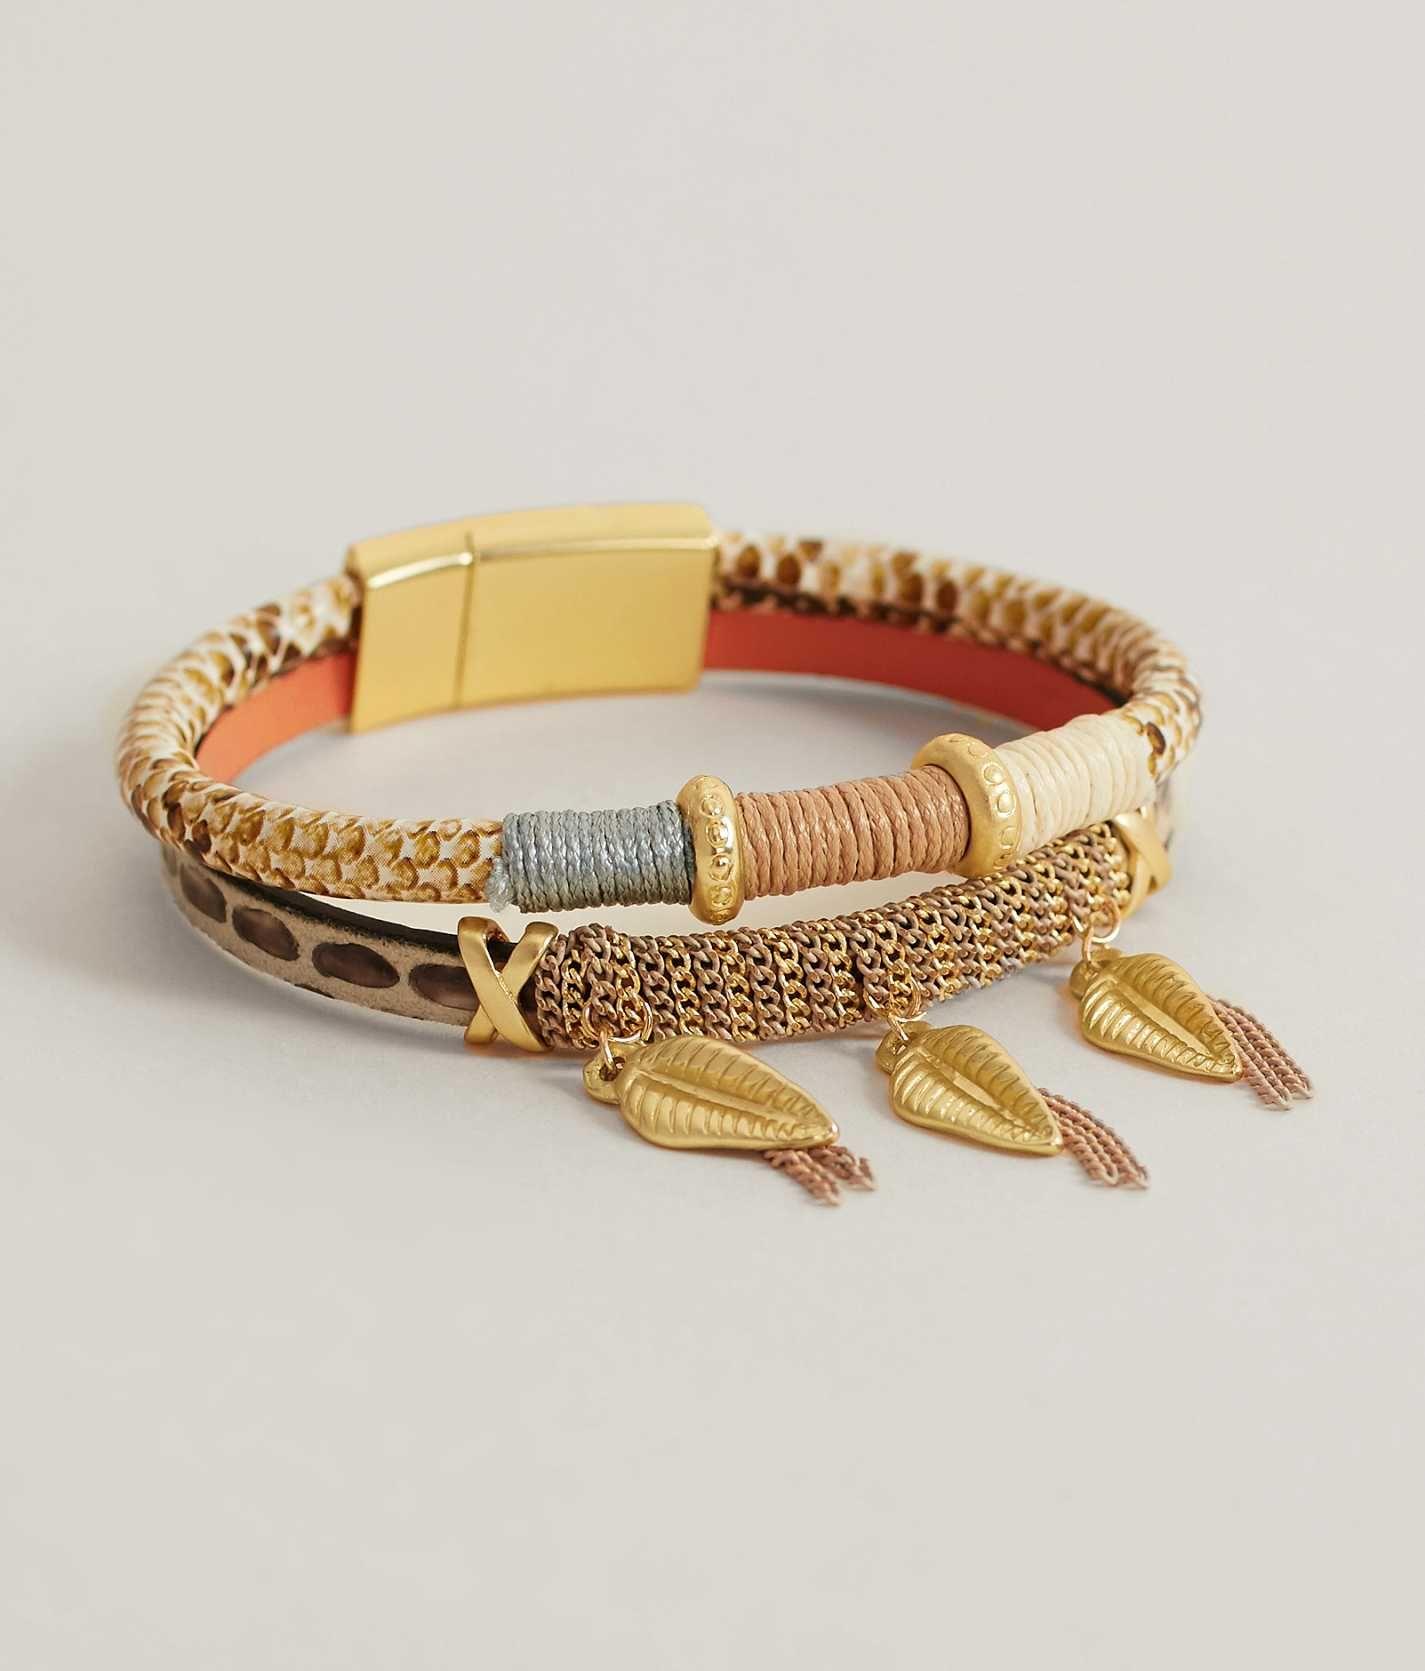 Bke tarot bracelet womenus accessories in cream gold buckle